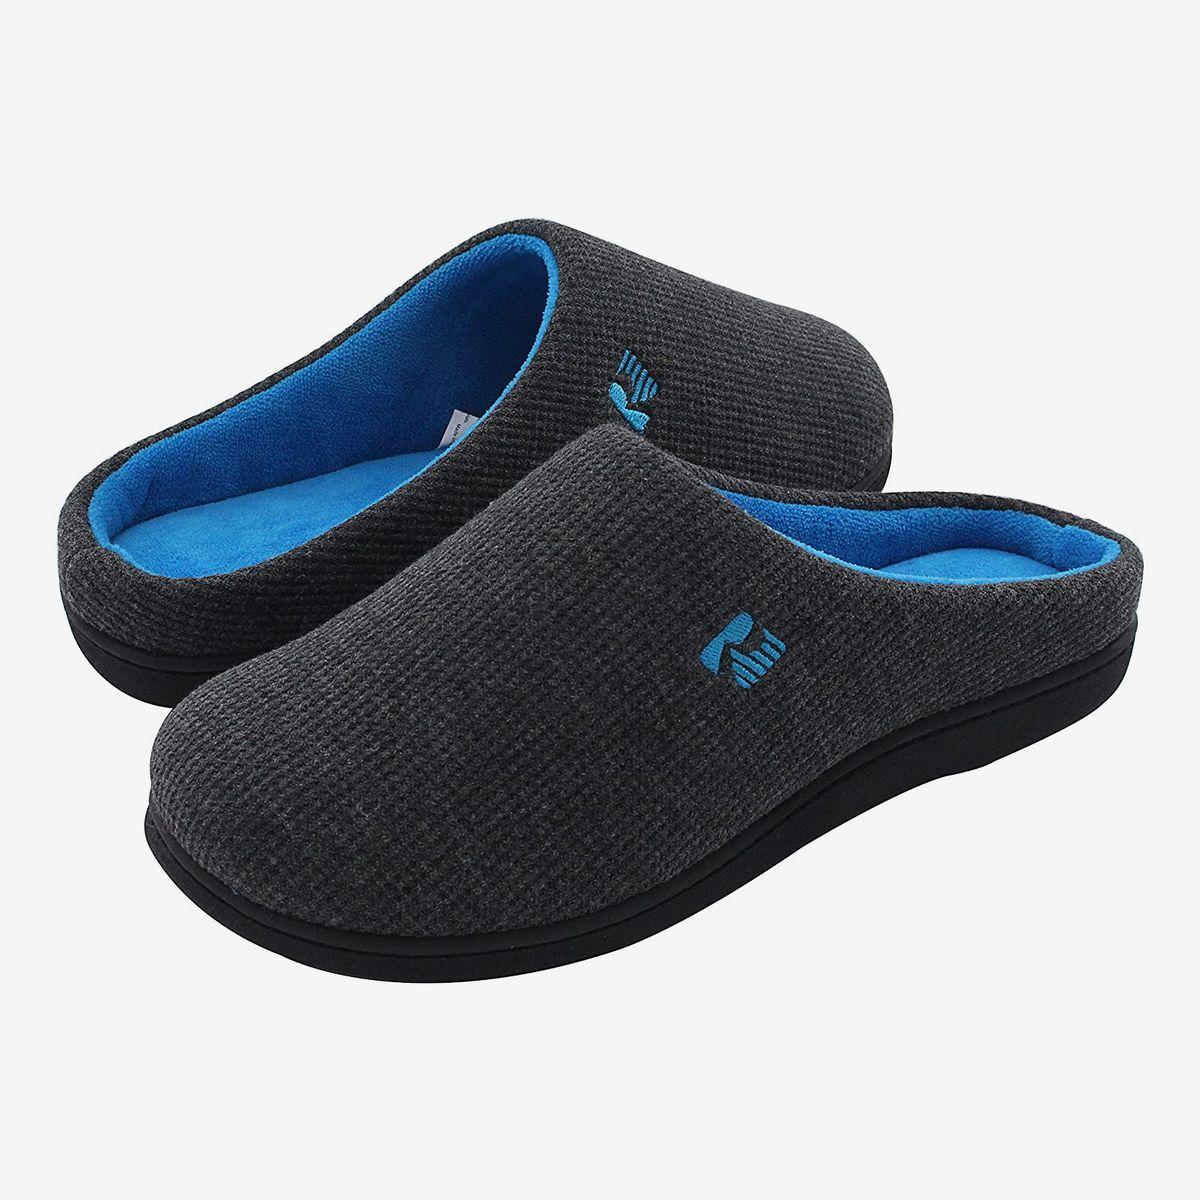 Mens Slippers Winter Relax Soft Fluffy Lightweight Easy Slip on Size S M L NEW